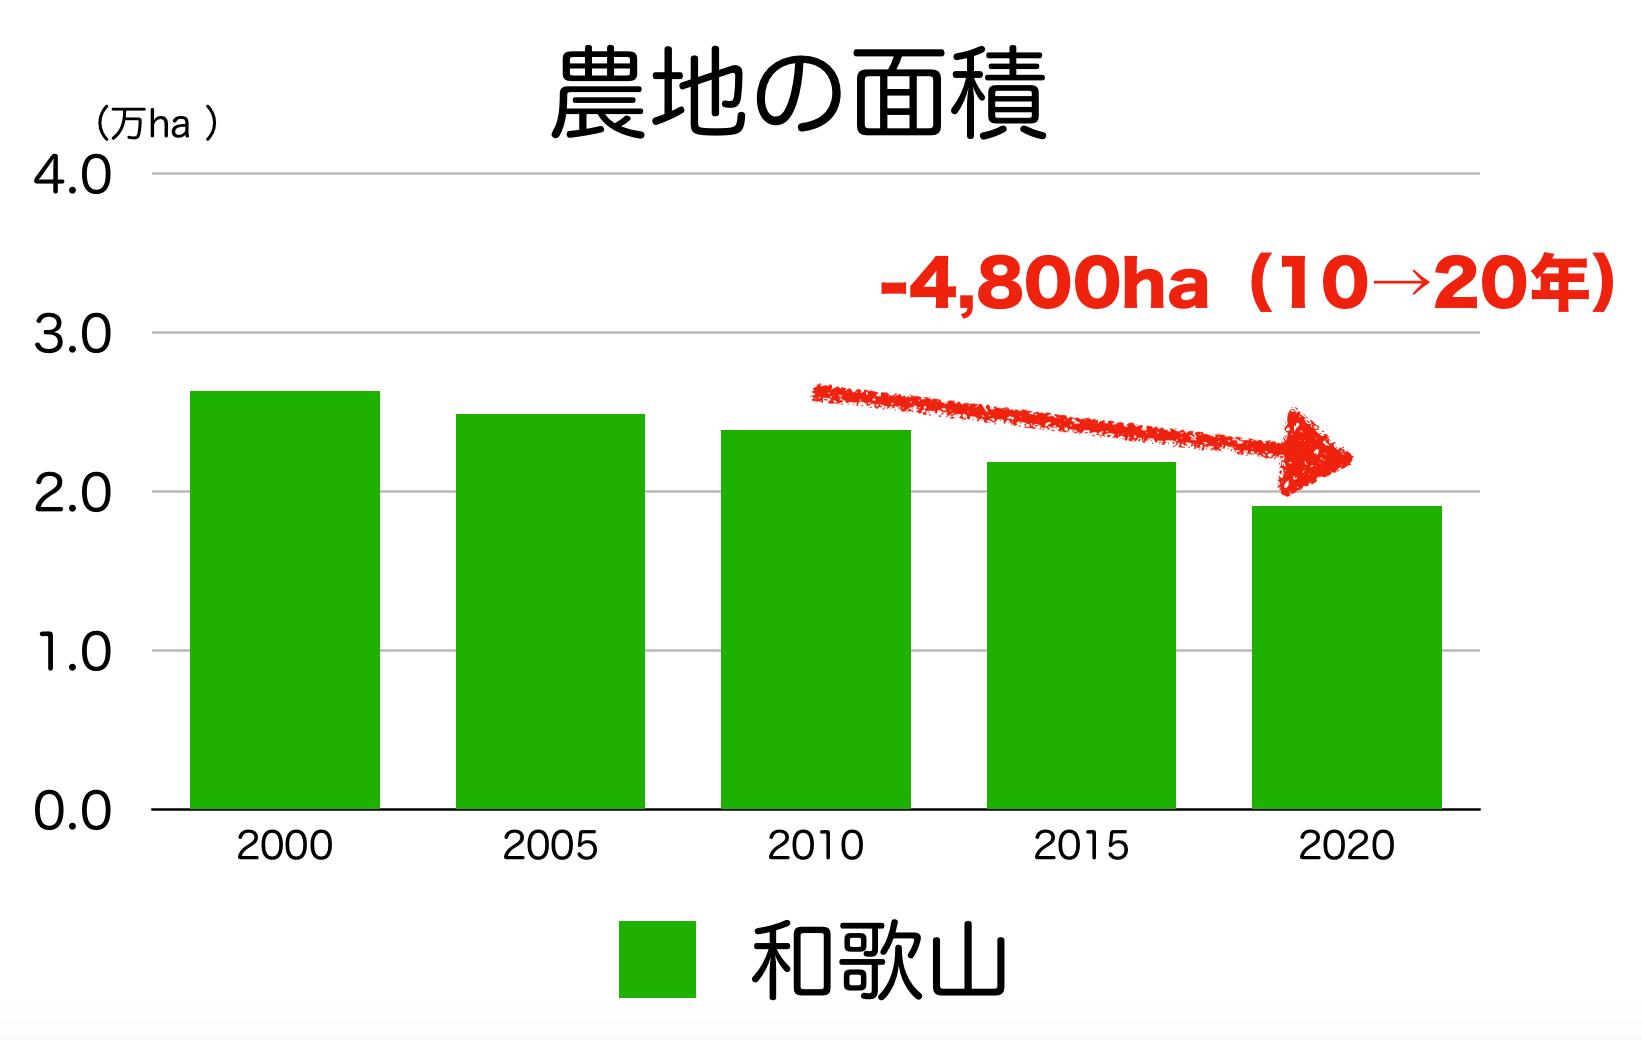 和歌山県の農地面積